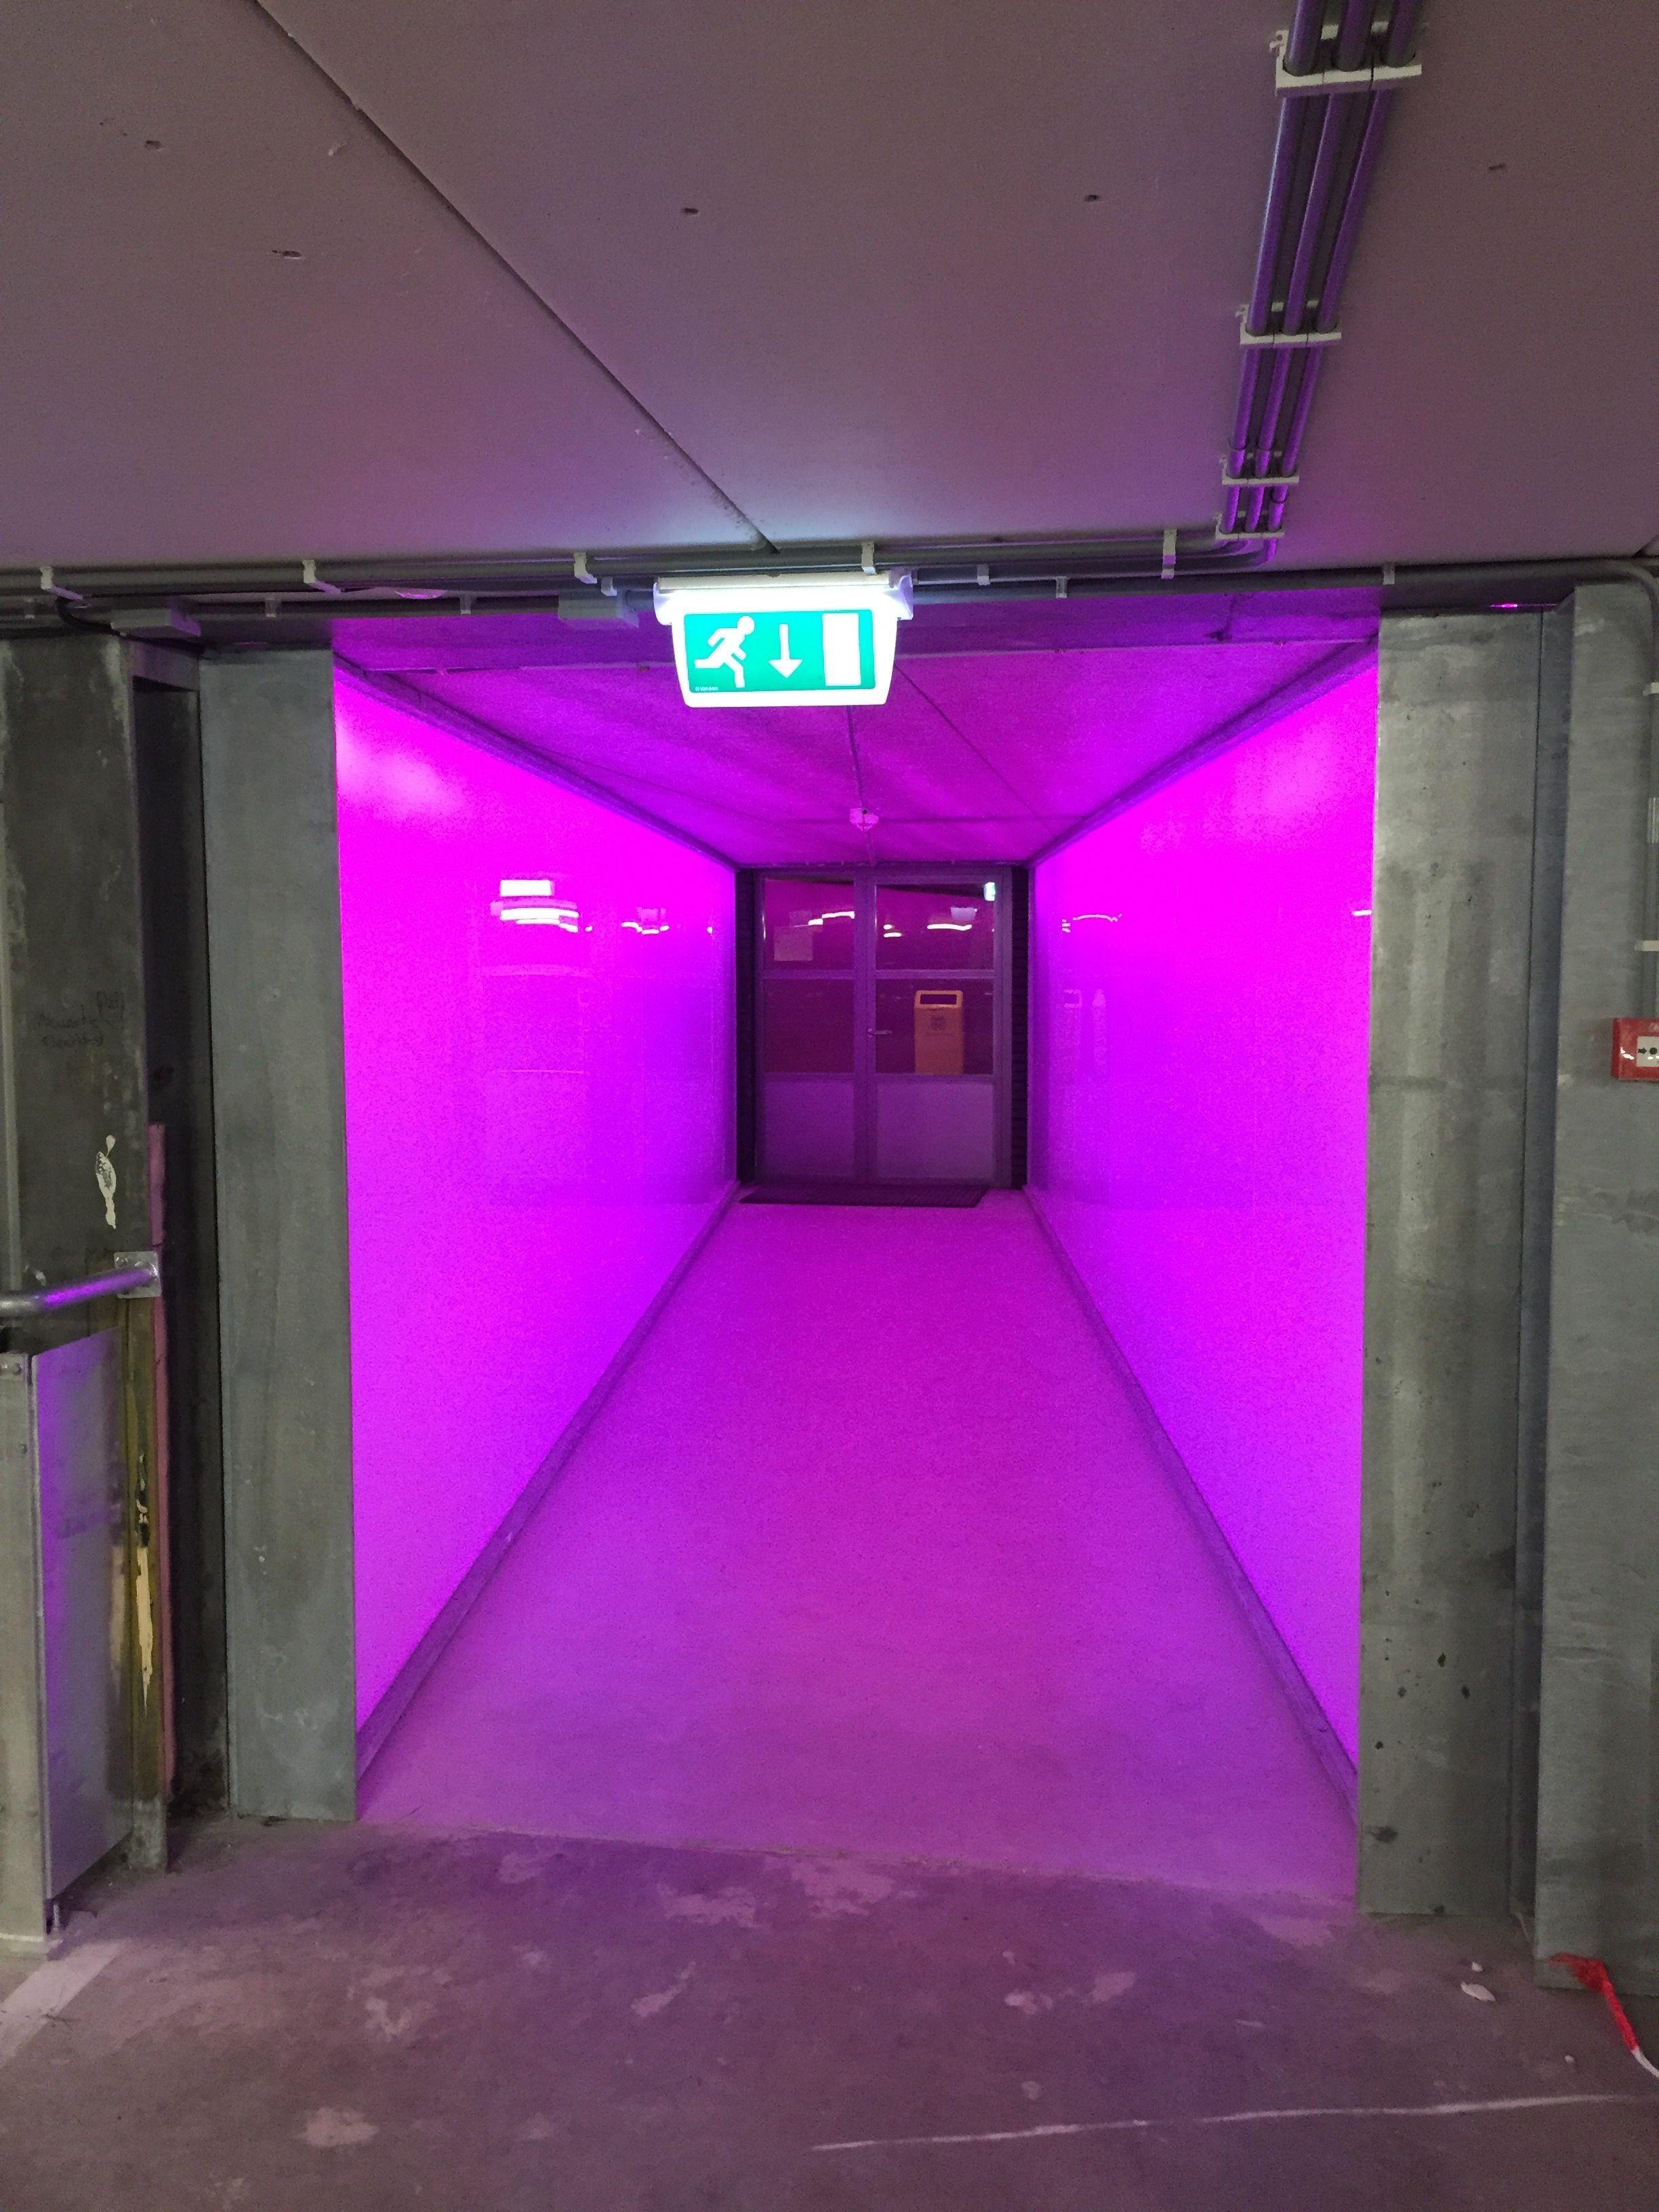 smartlightnl tunnel van licht tilburg parkeergarage tivoli